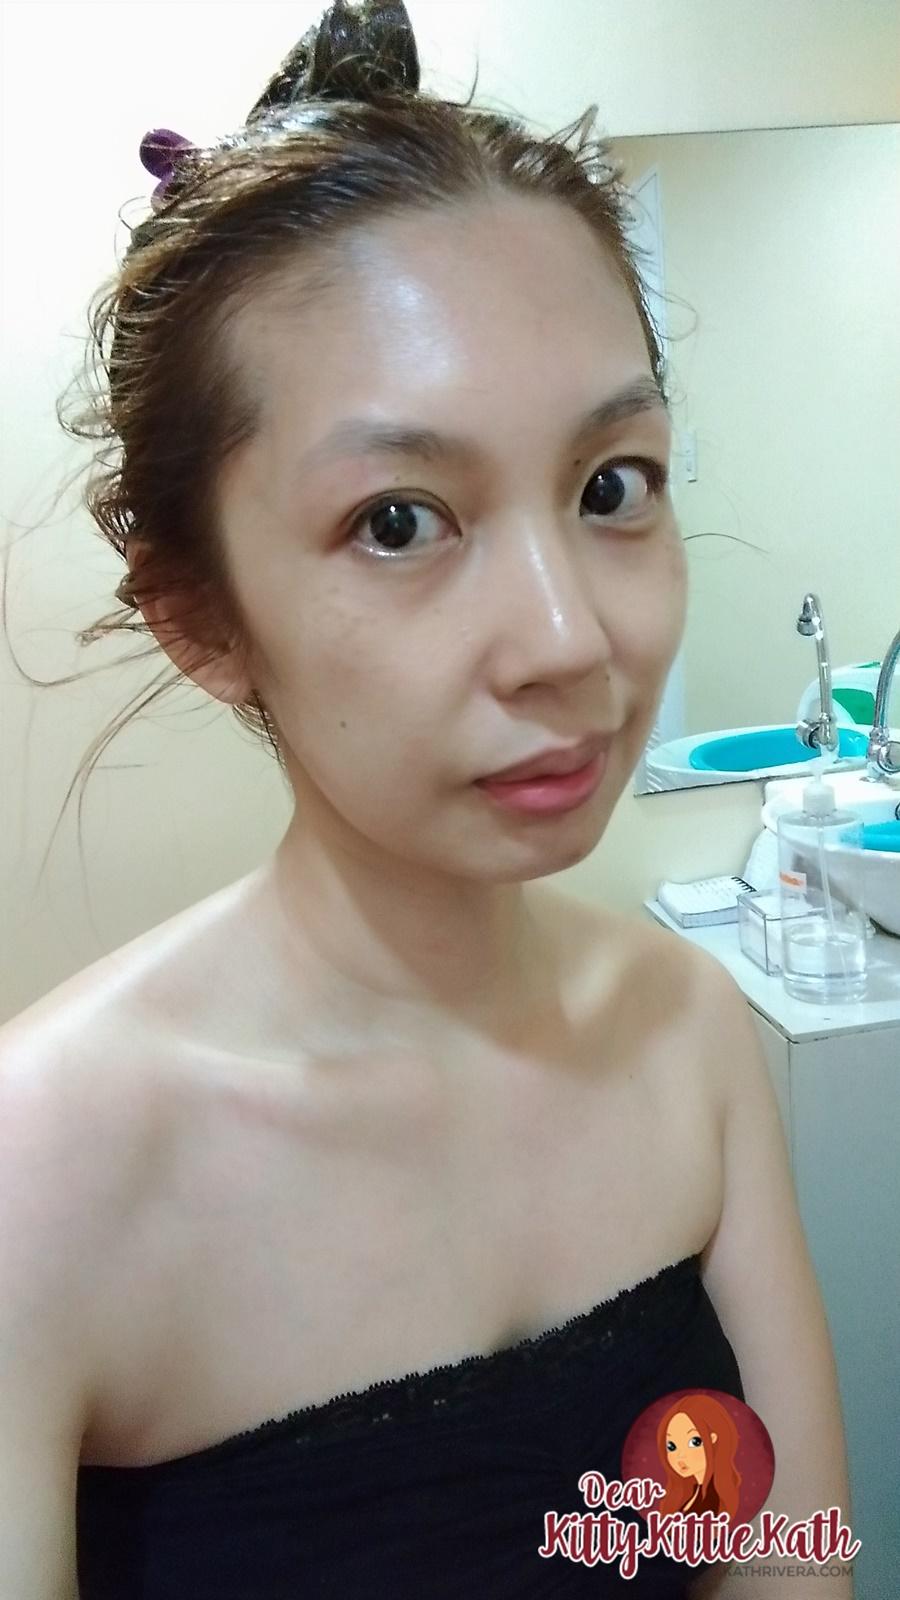 Guinot Hydradermie Facial Treatment at David's Salon Pardon the no makeup and just woke up shot